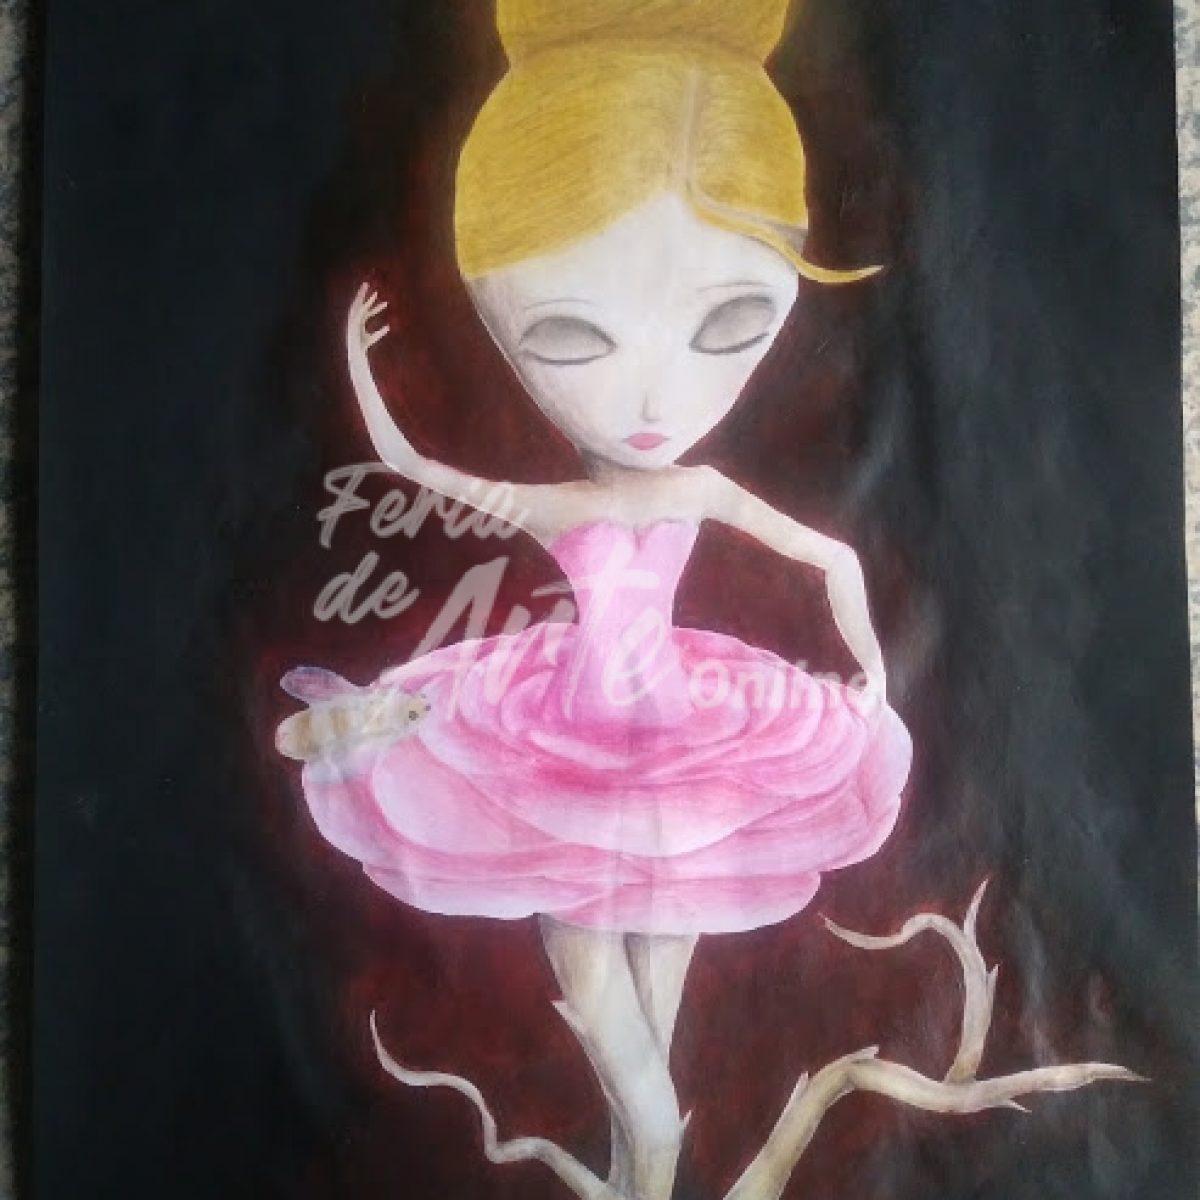 La flor del ballet